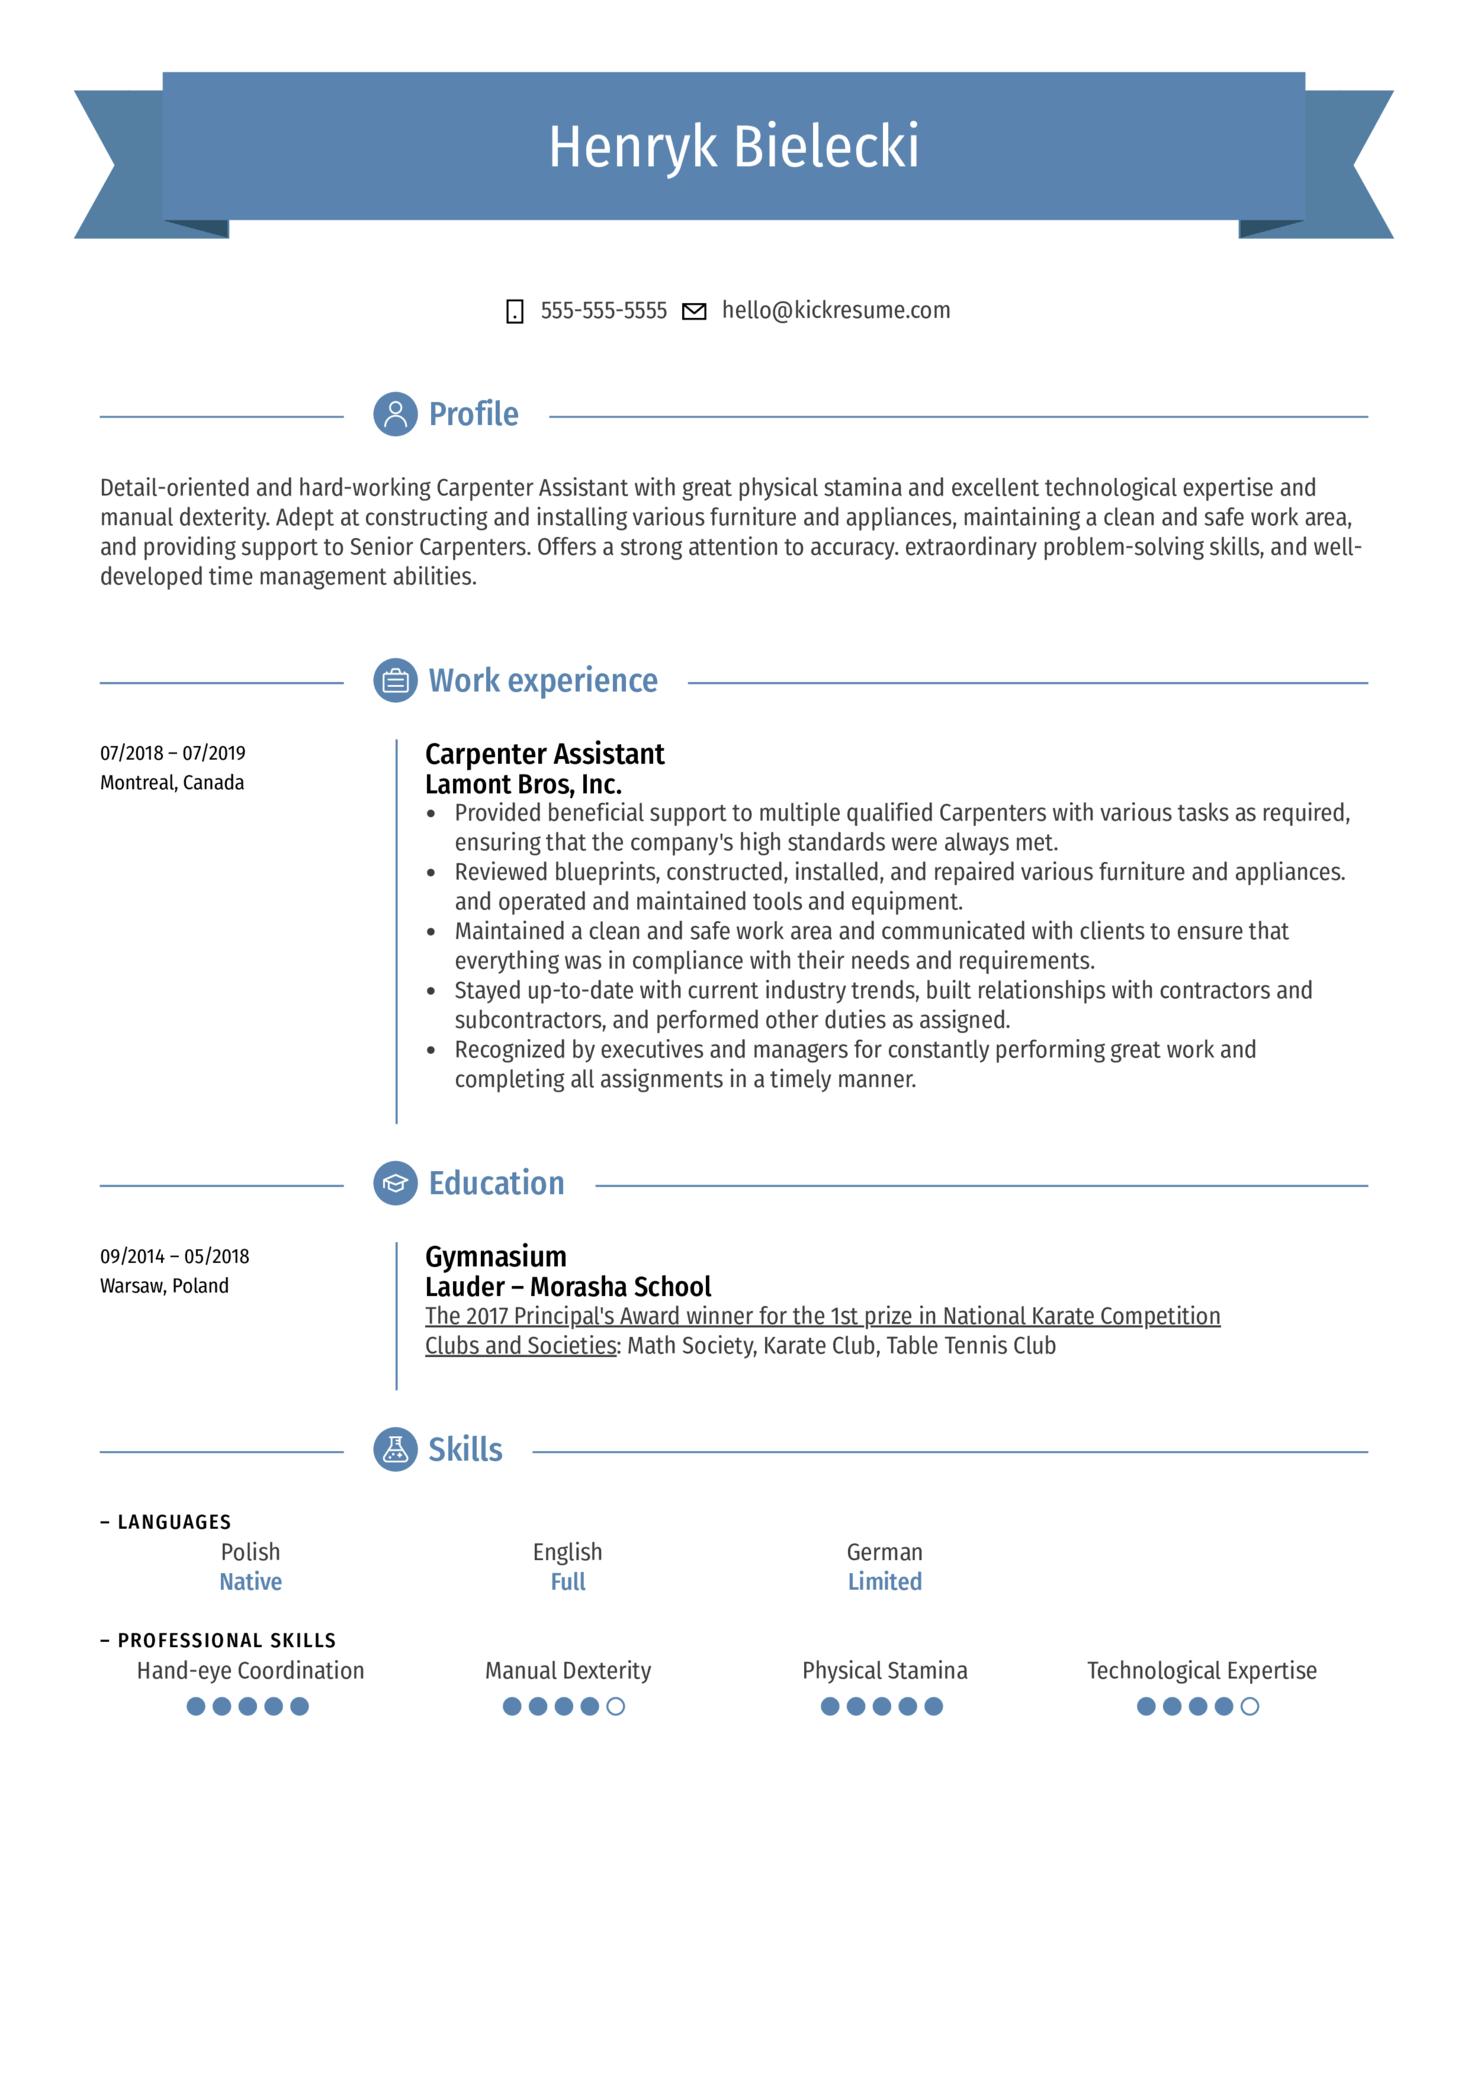 Carpenter Assistant Resume Sample (Part 1)